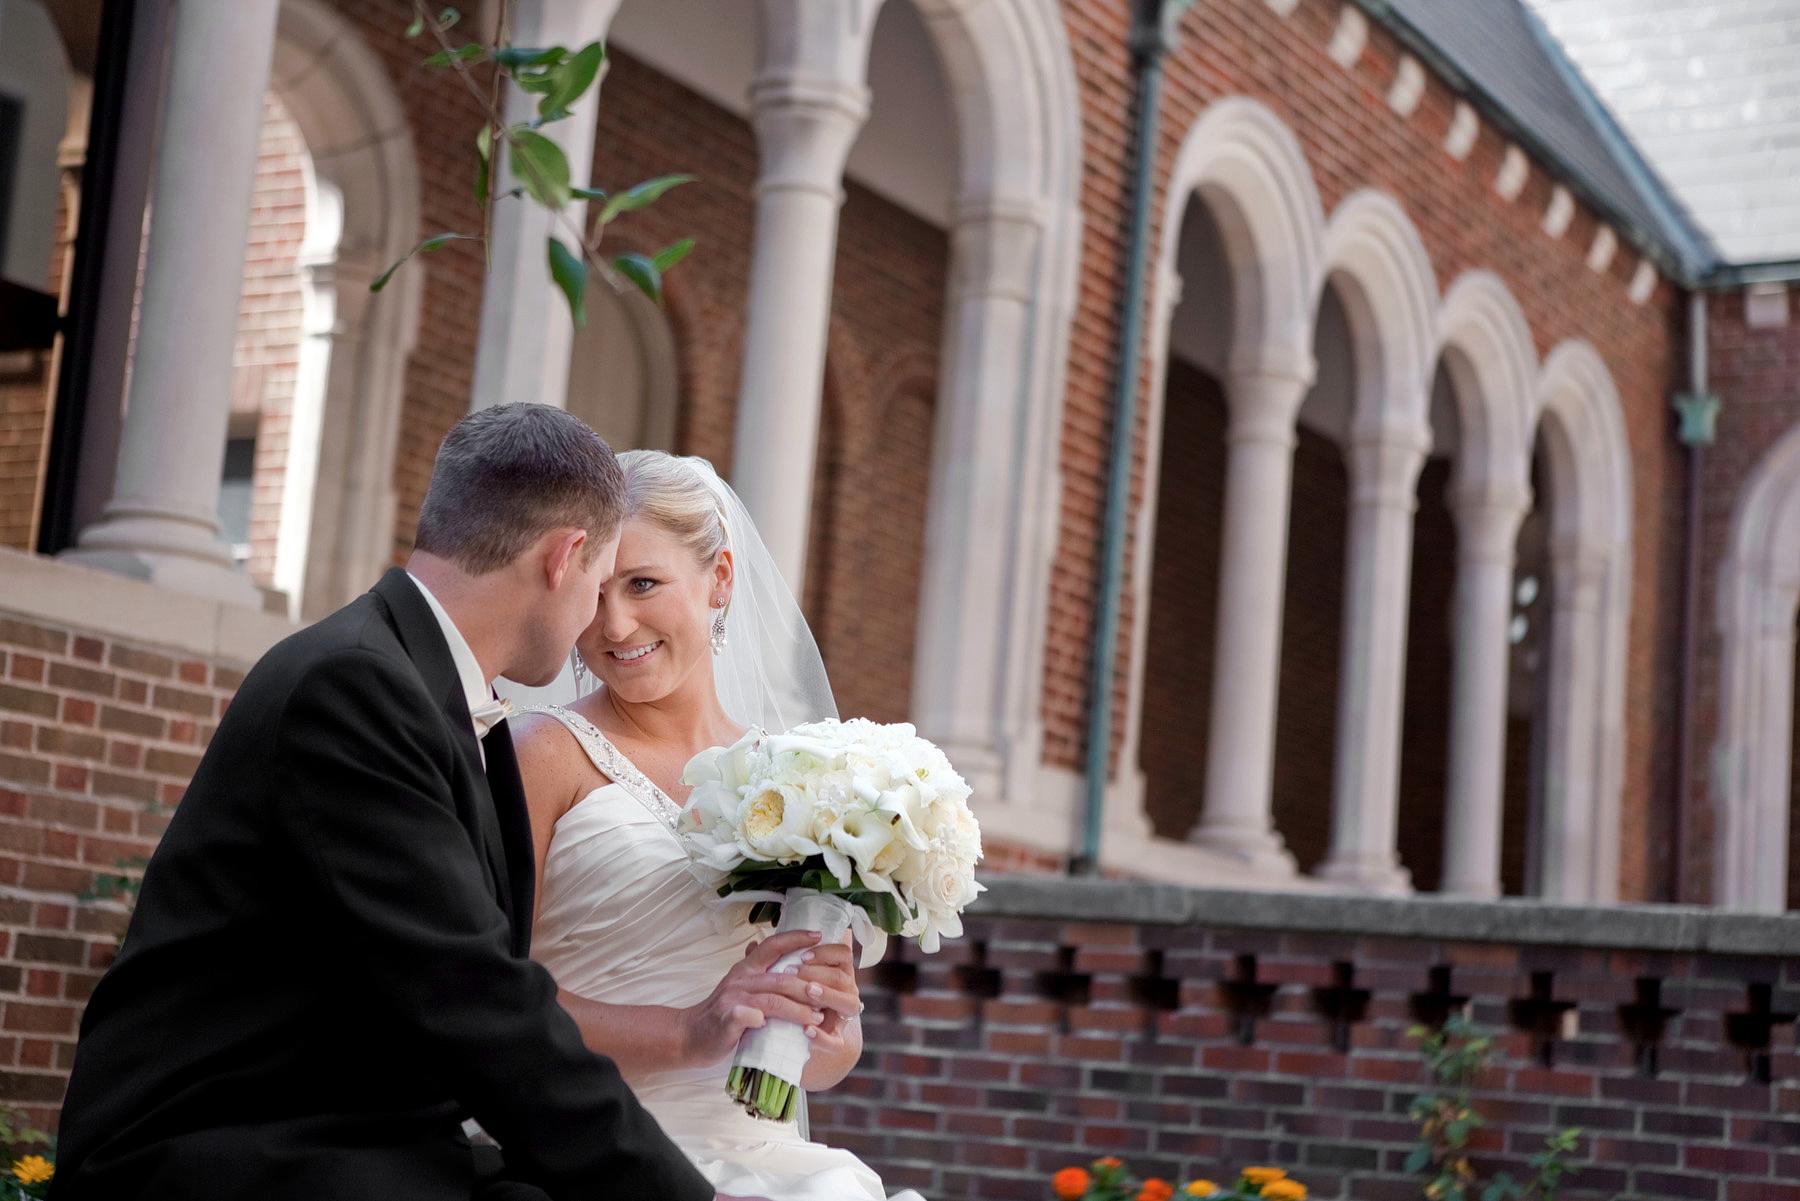 minnesota-wedding-photographers-mark-kegans-918.jpg